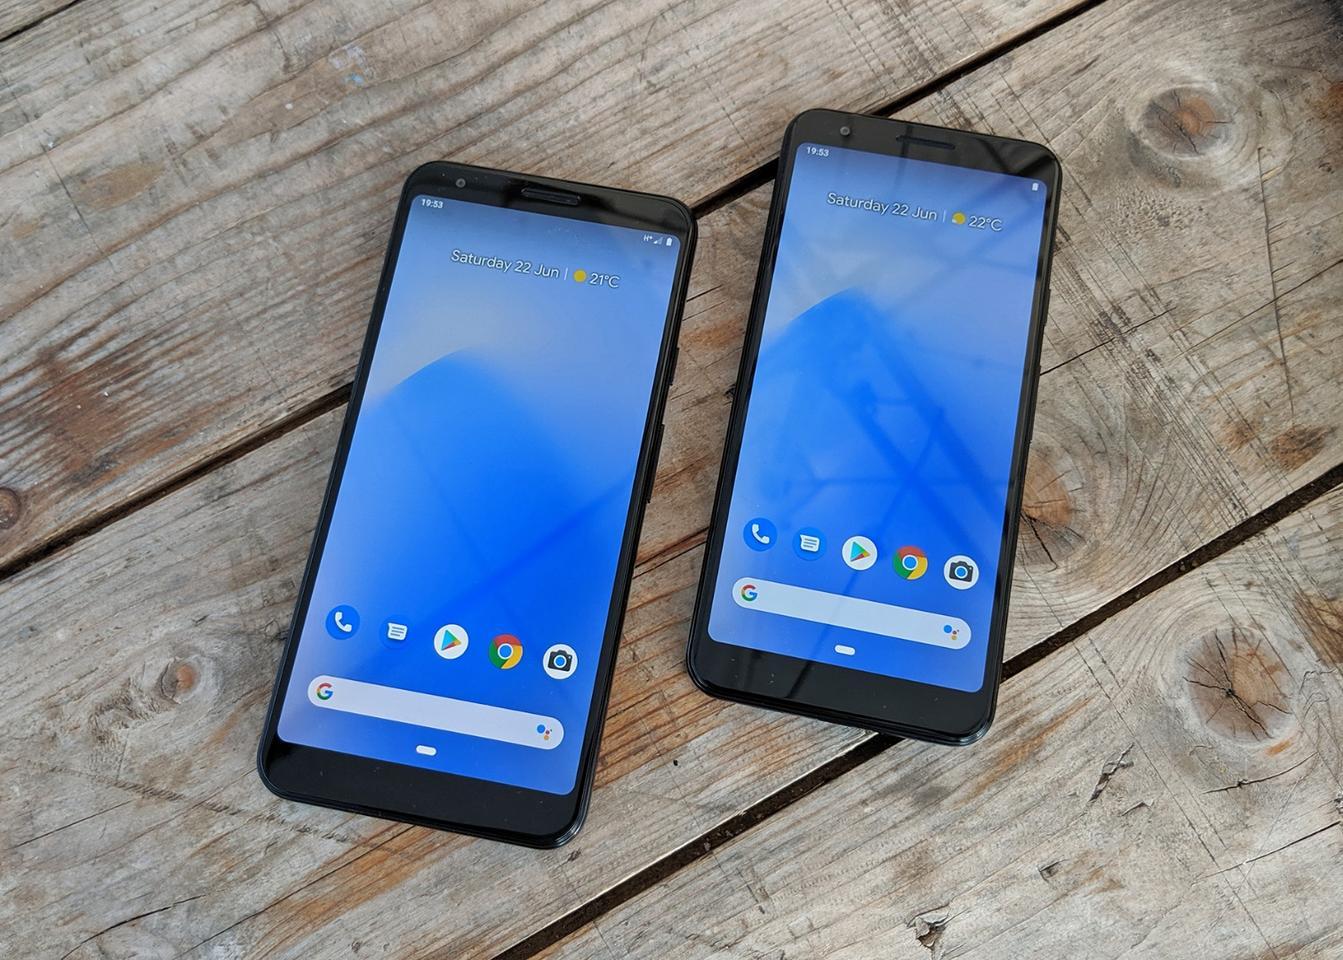 Google Pixel 3a and 3a XL review: Mid-range smartphones